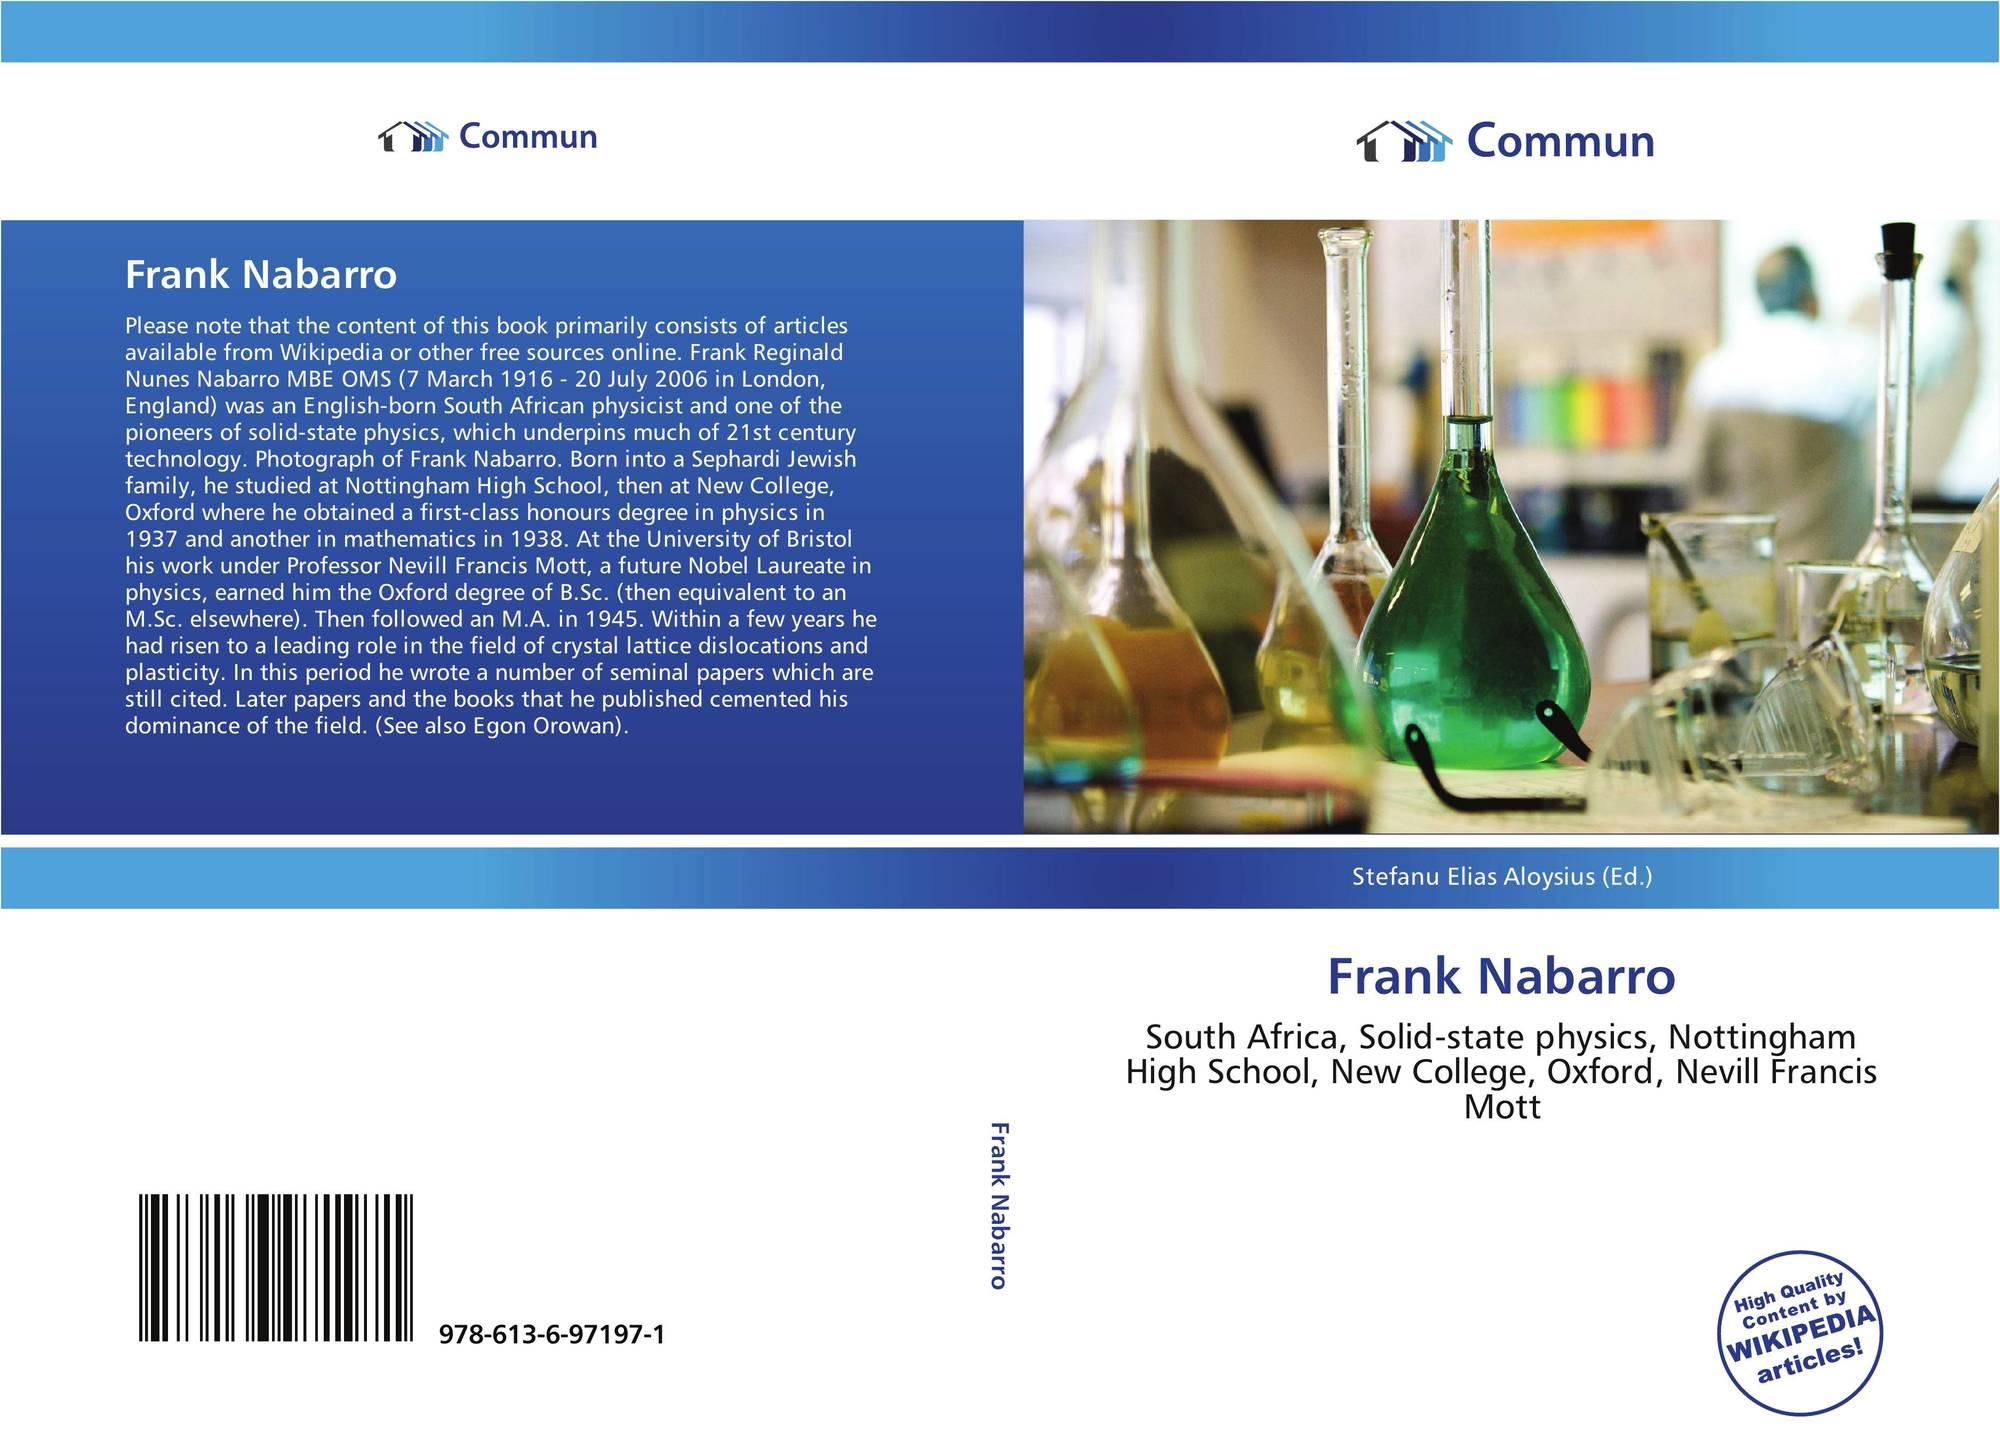 Frank Nabarro, 978-613-6-97197-1, 6136971976 ,9786136971971